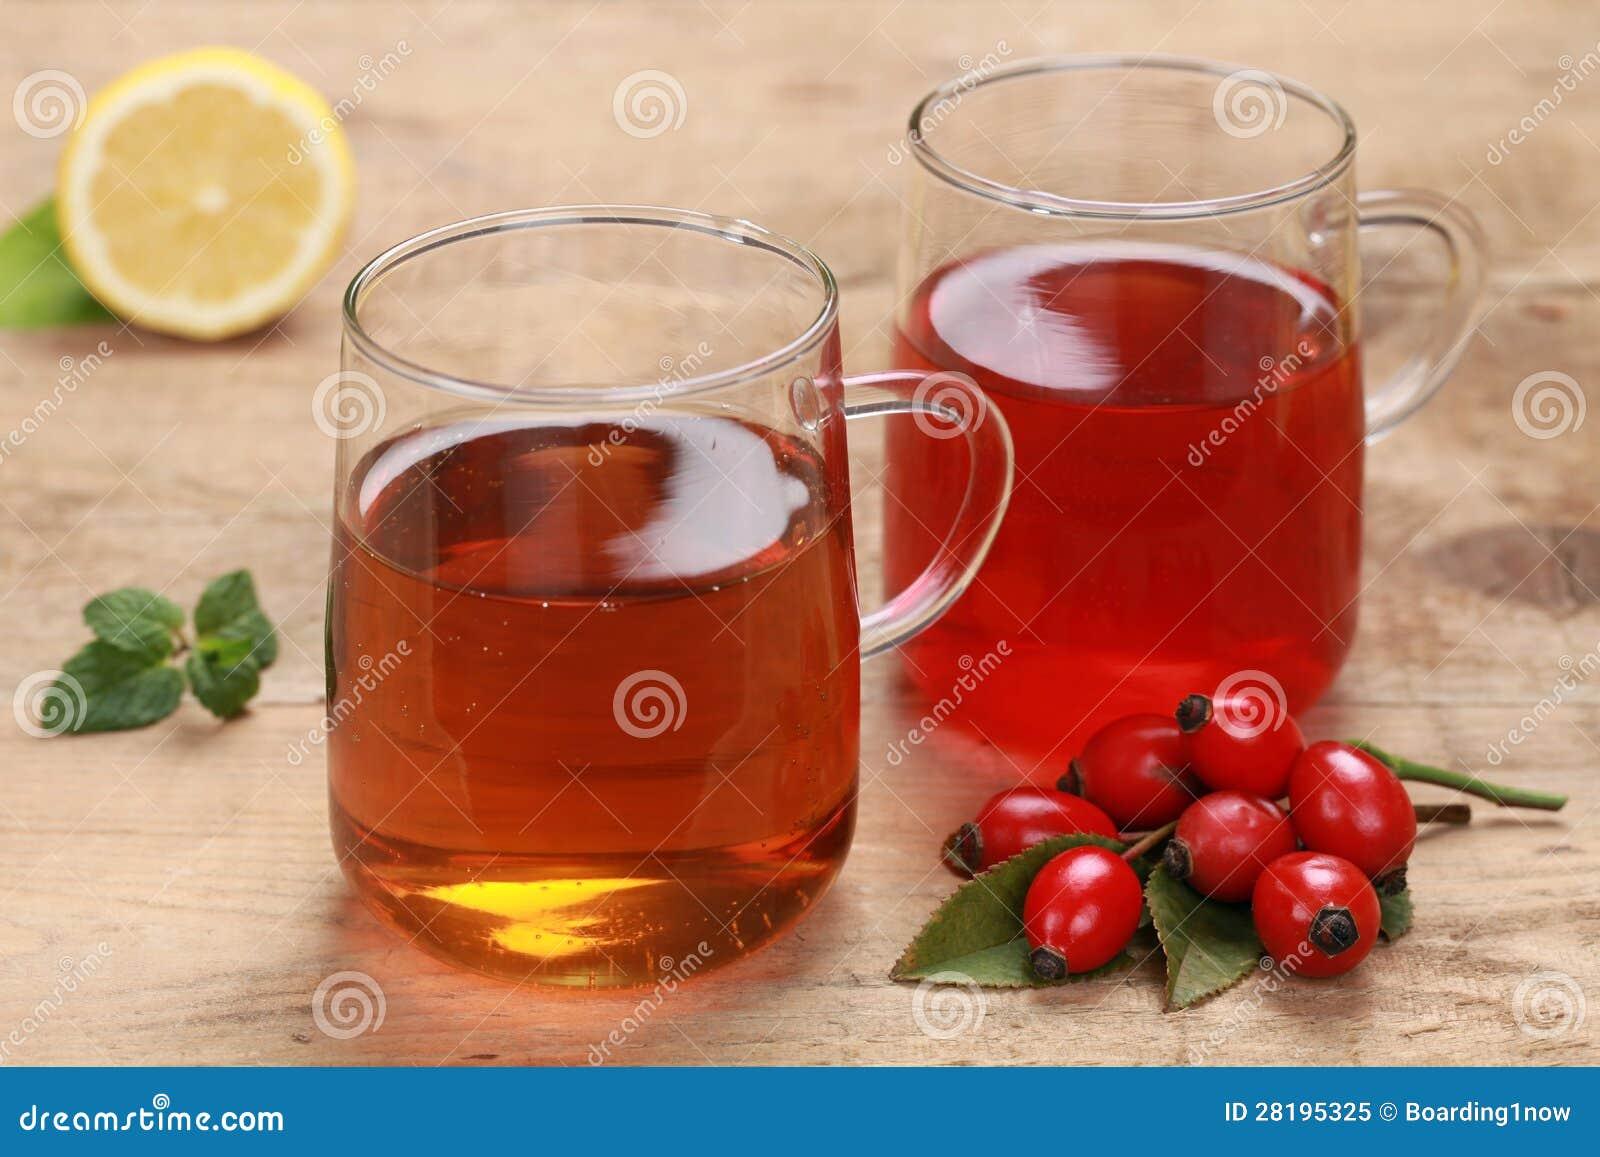 Rooibos和野玫瑰果茶